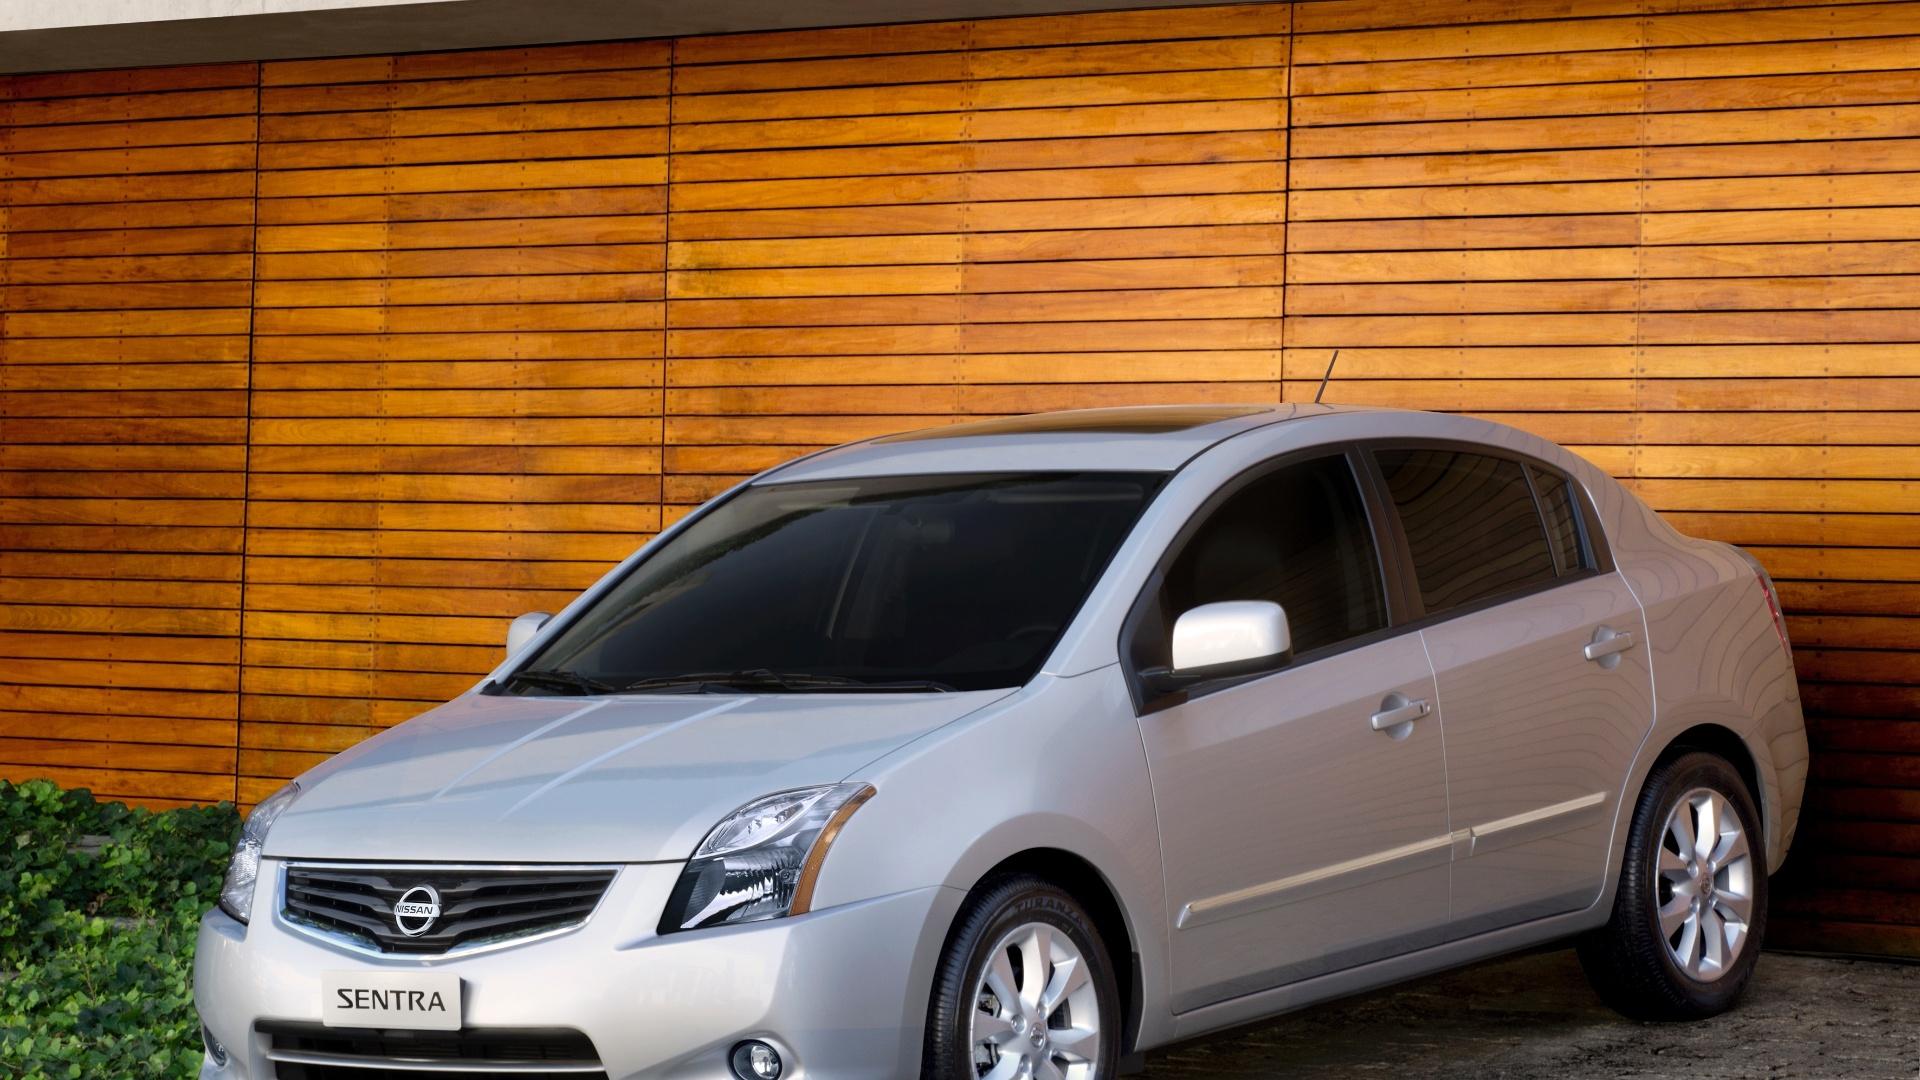 Nissan sentra 2013 manual